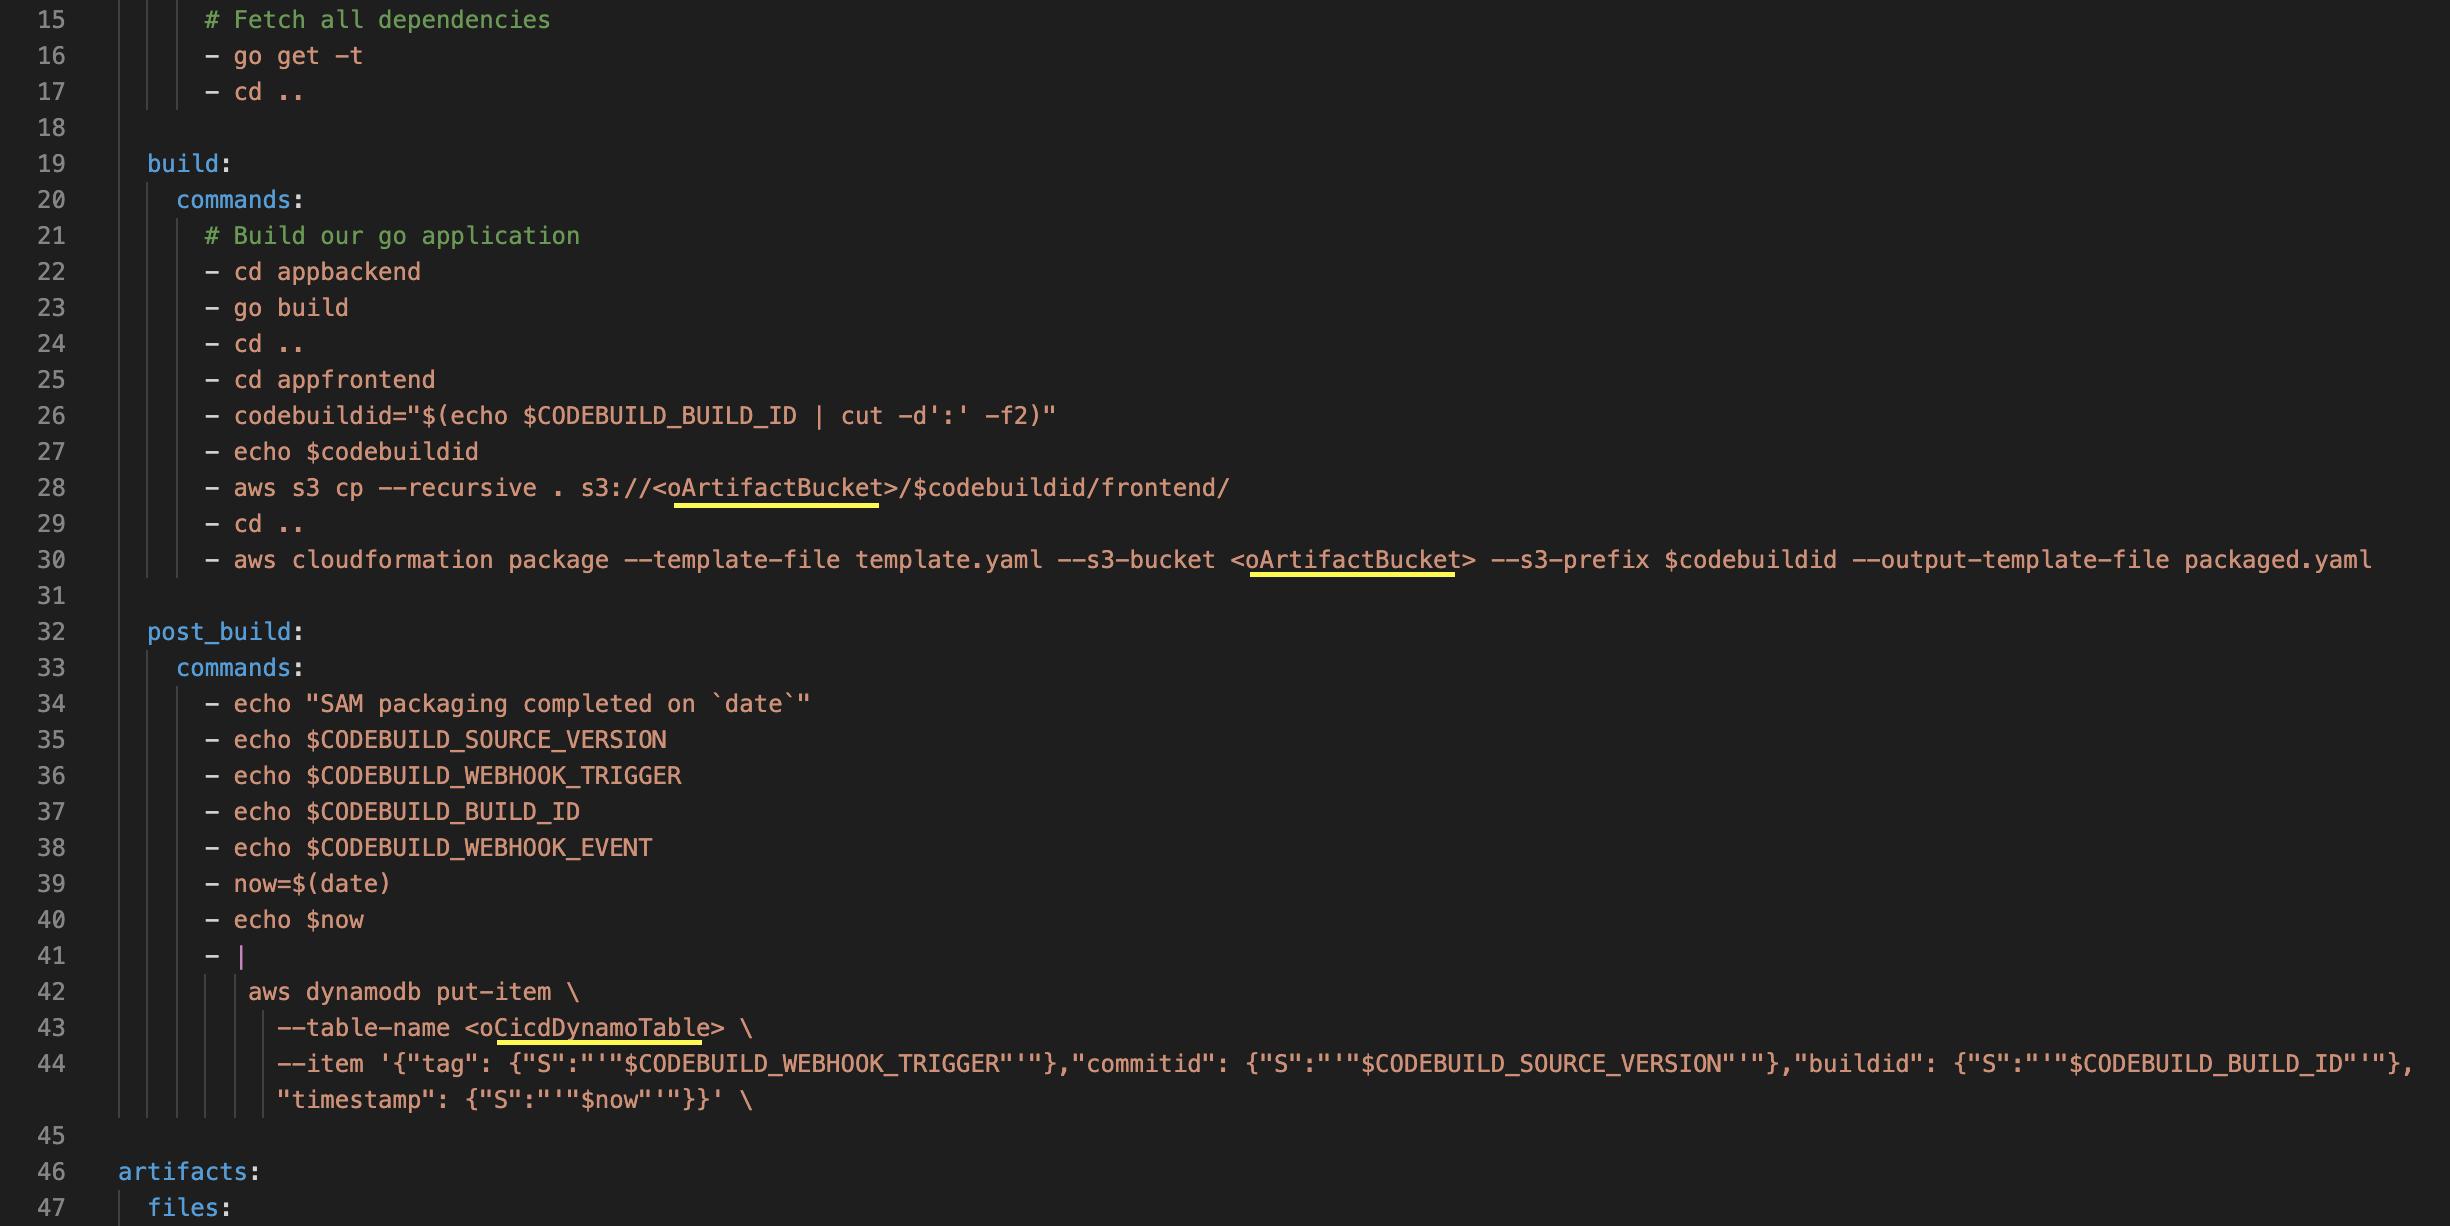 sample-buildspec